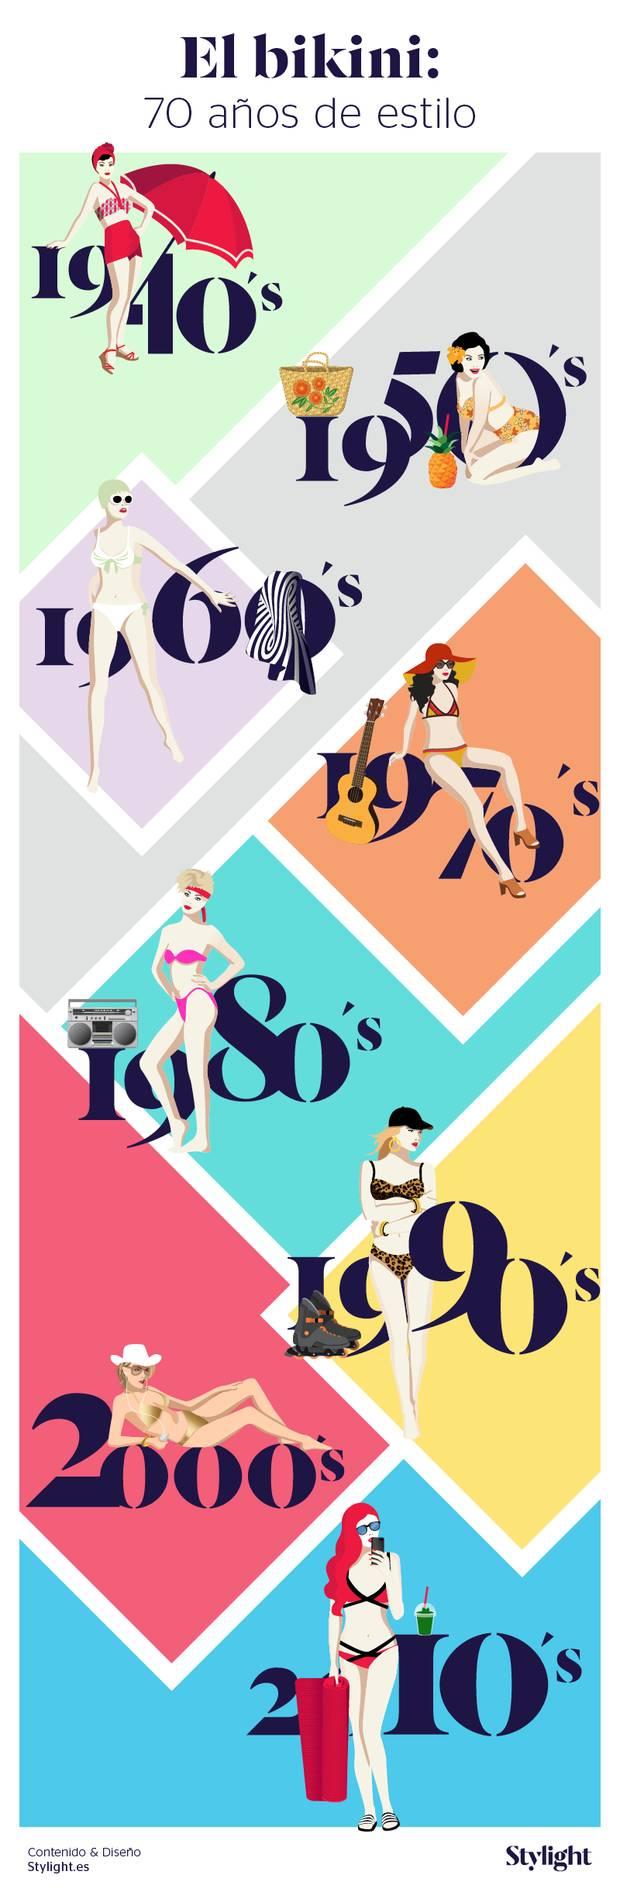 estamos-aniversario-feliz-70-cumpleanos-querido-bikini-stylight-70-anos-estilo